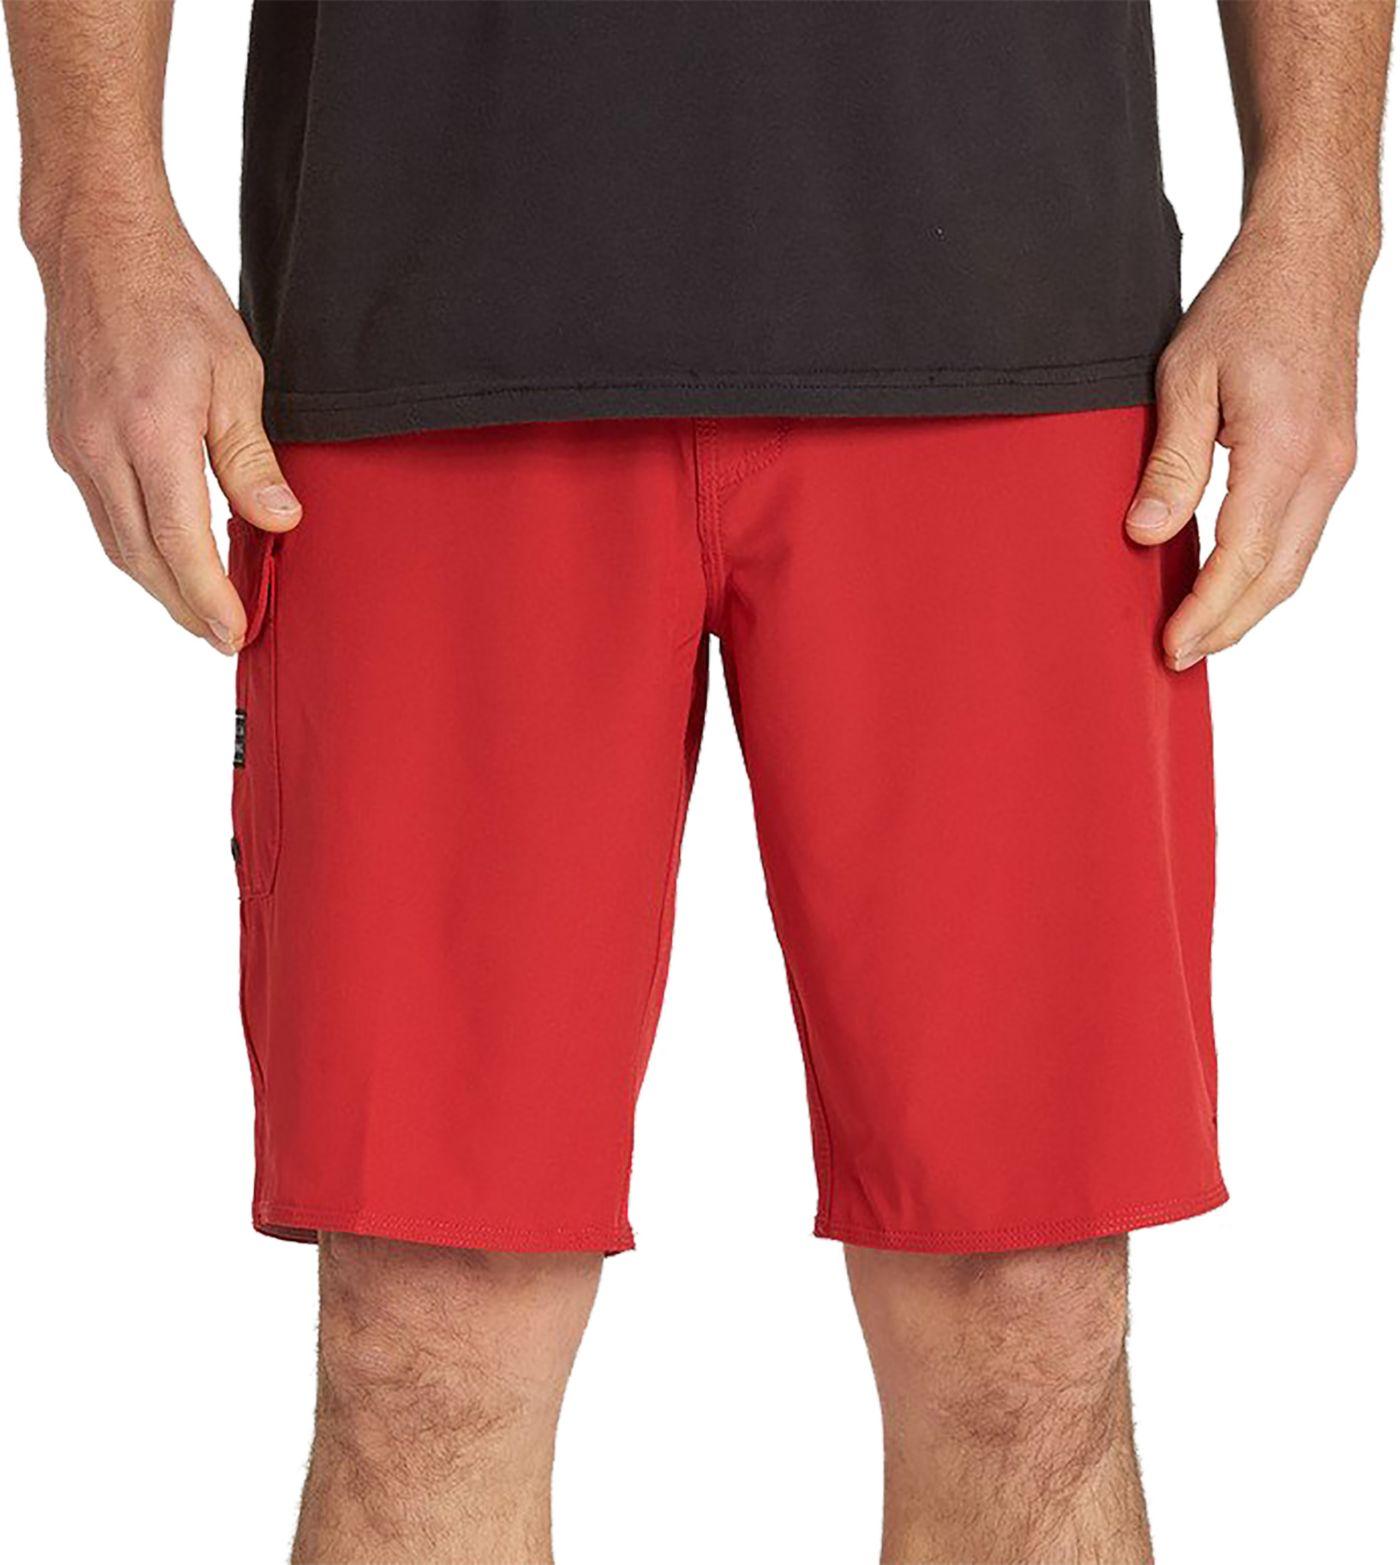 Billabong Men's All Day Pro Board Shorts